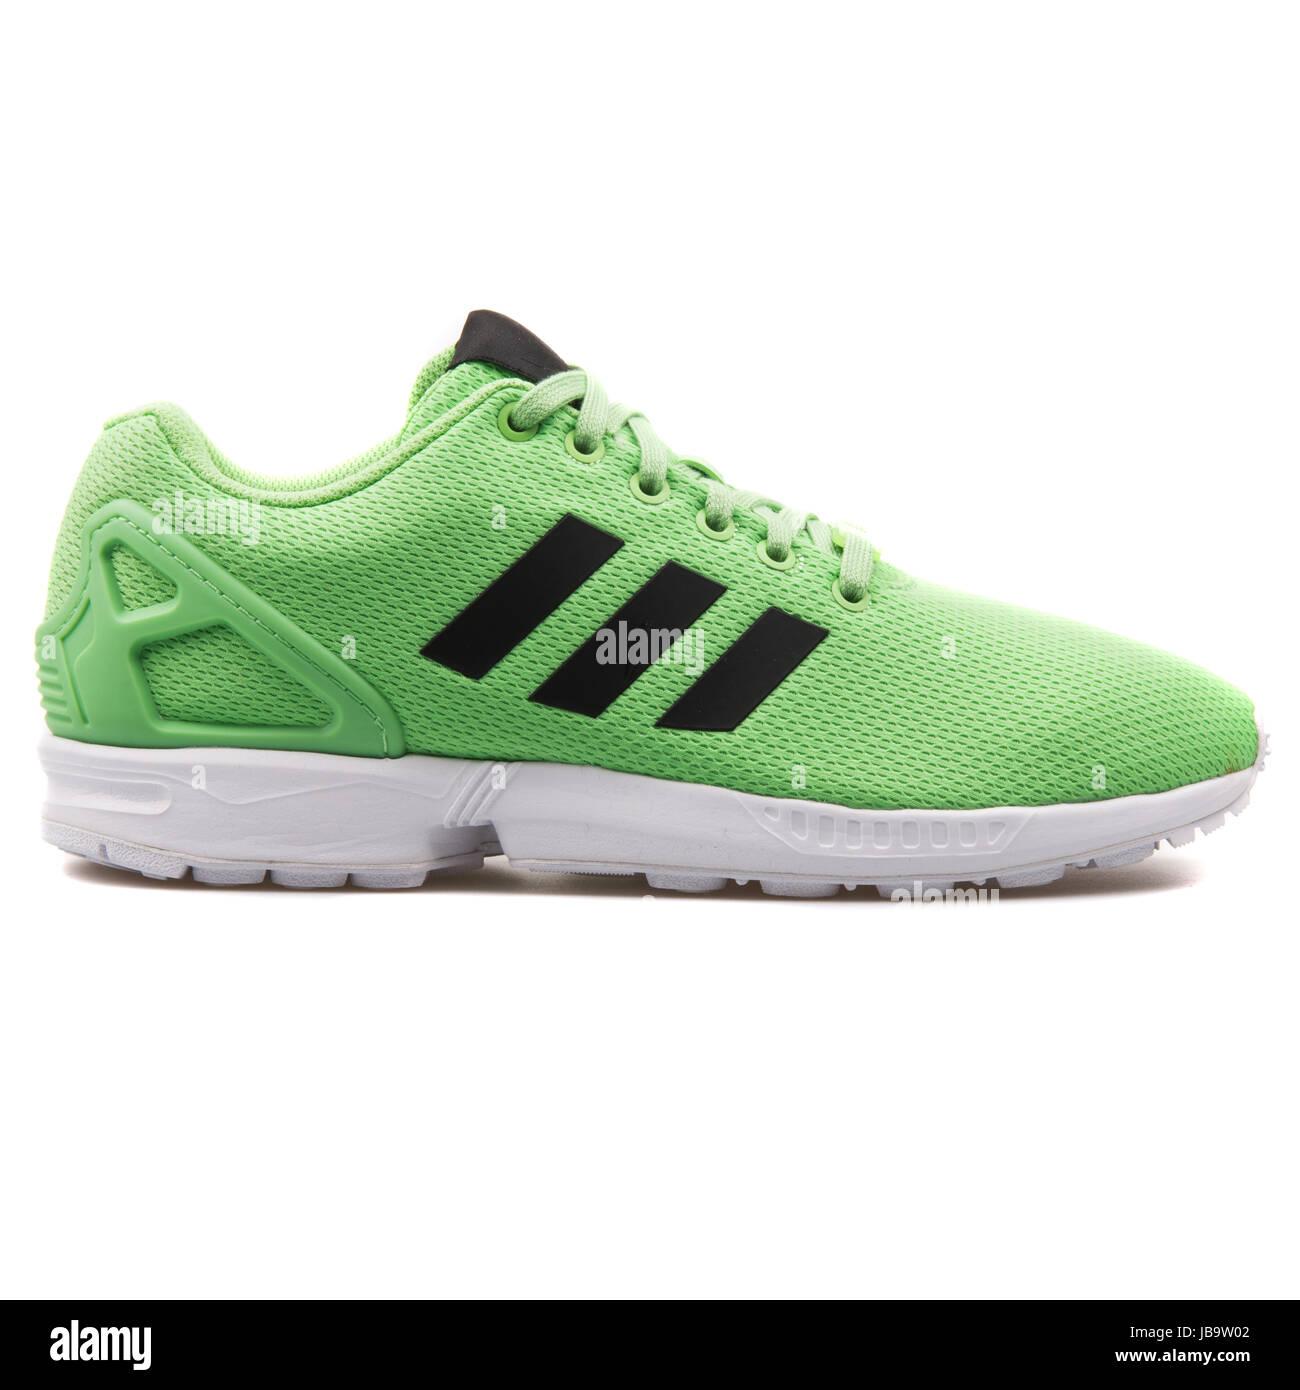 Adidas ZX Flux Blue Men's Running Shoes AF6344 Stock Photo